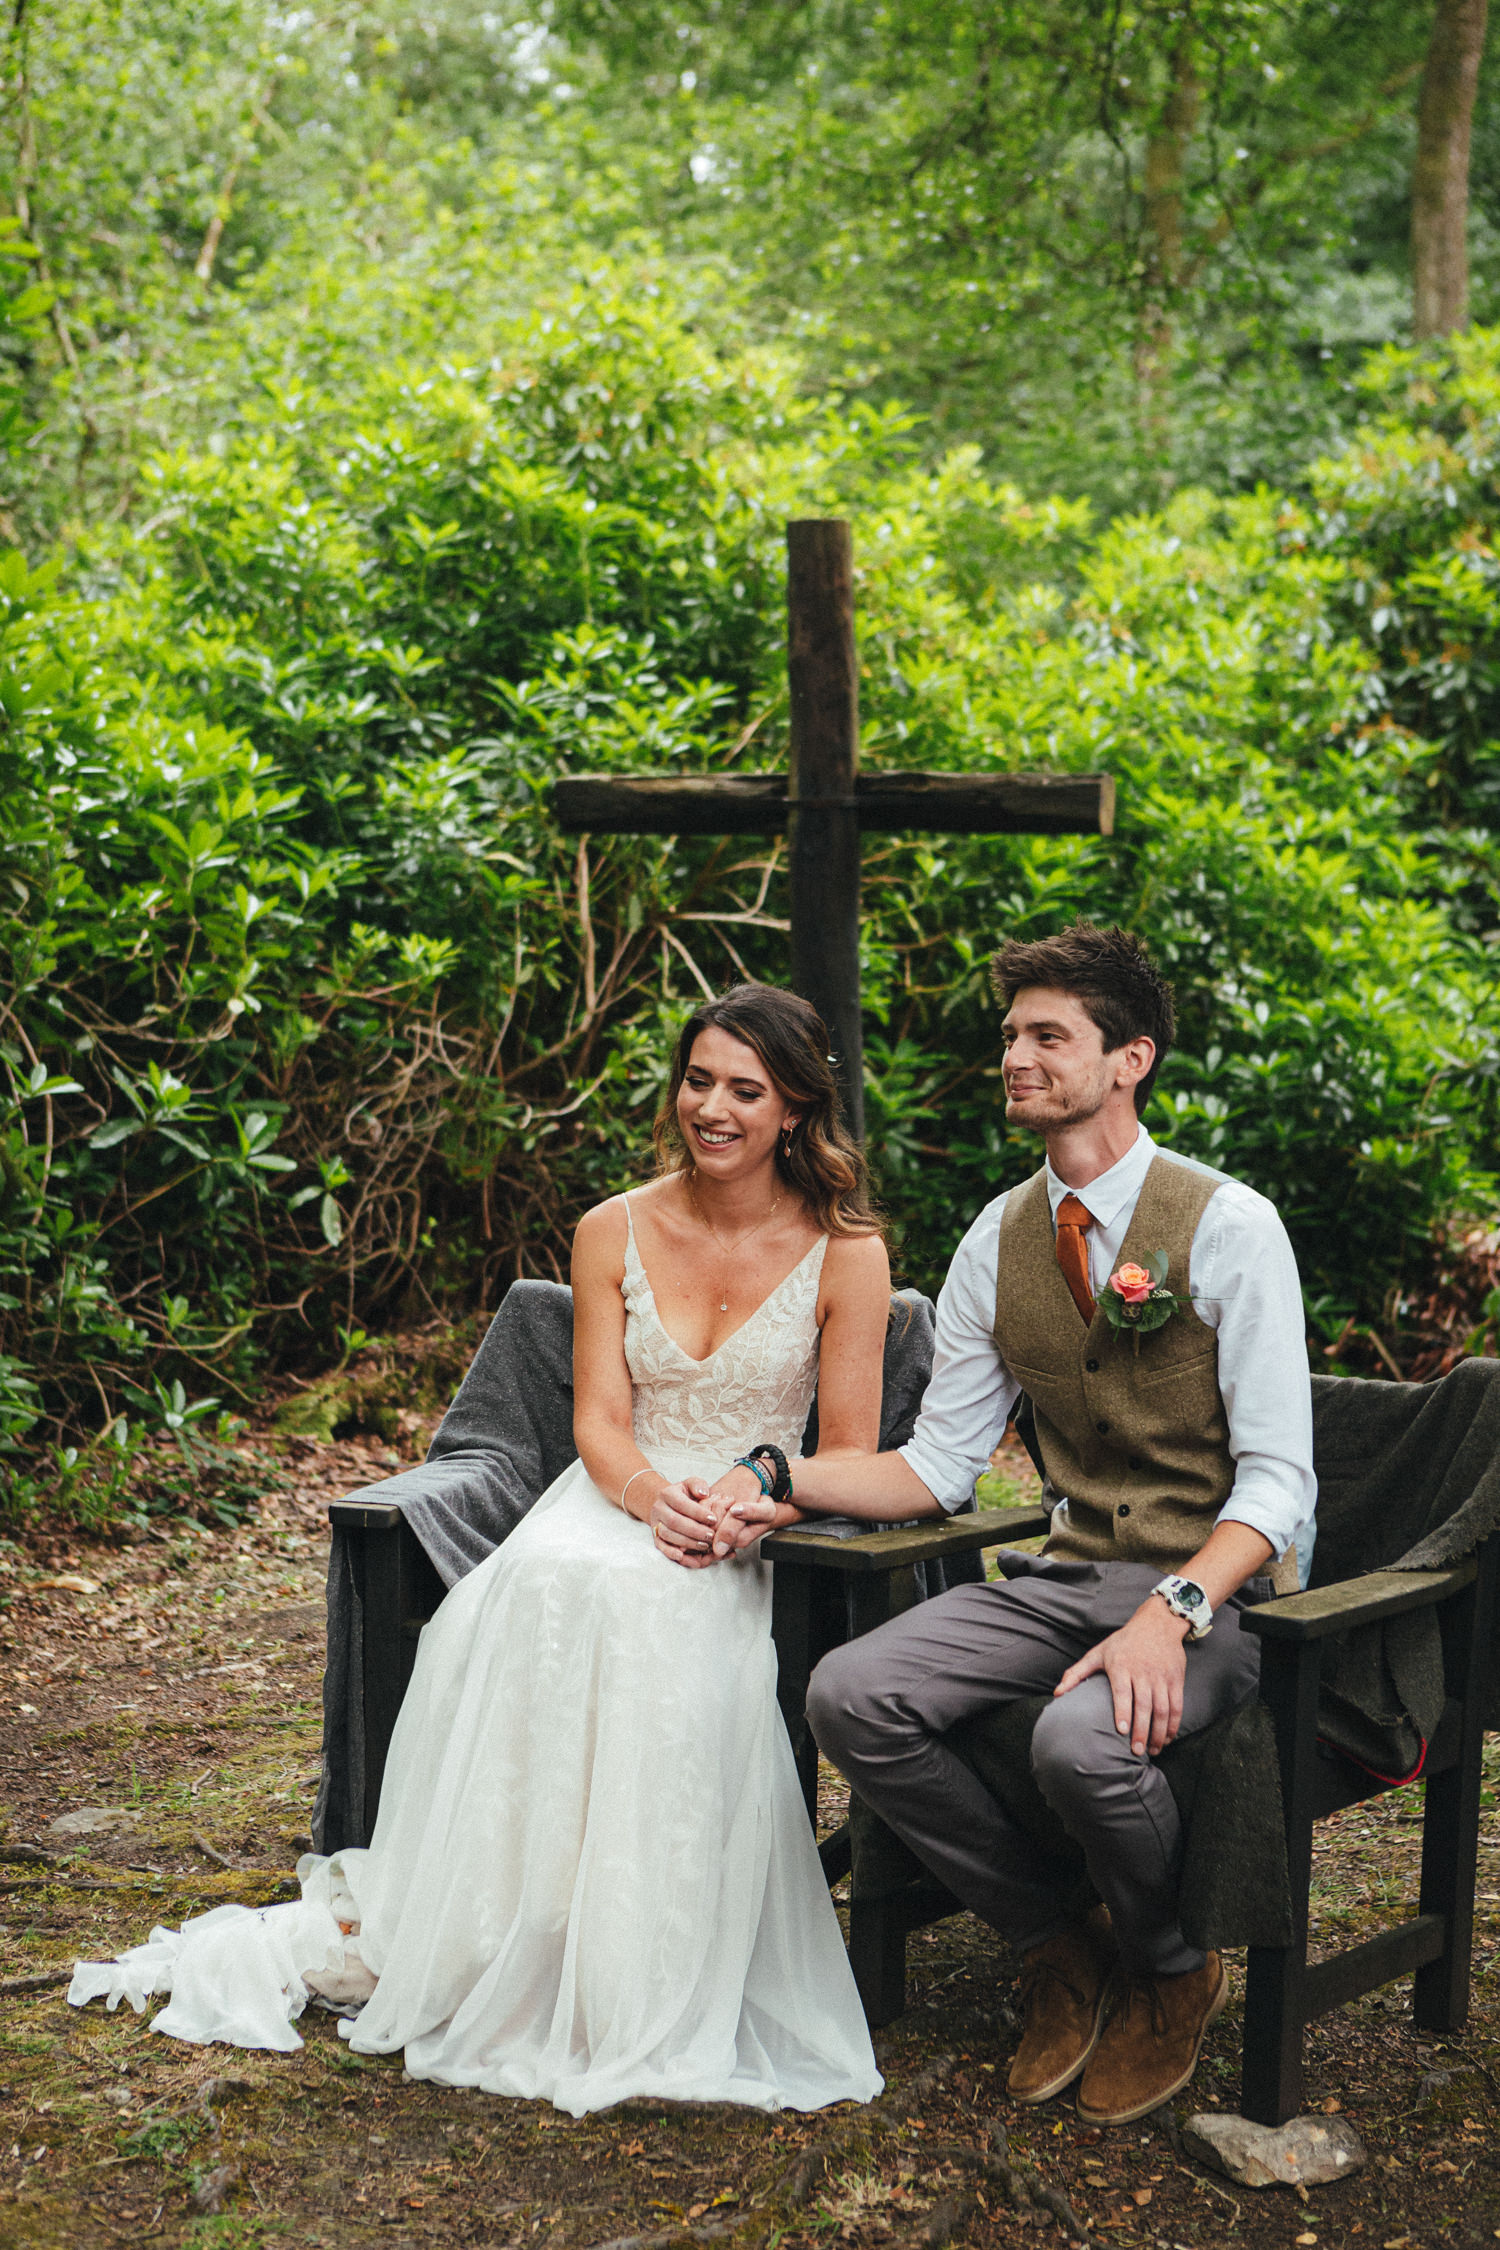 Bride and Groom, woodland wedding ceremony, outdoor wedding ceremony, forest wedding, woodland wedding, Quantock Hills, Great Wood Camp Wedding, Great Wood Camp Wedding Photography,